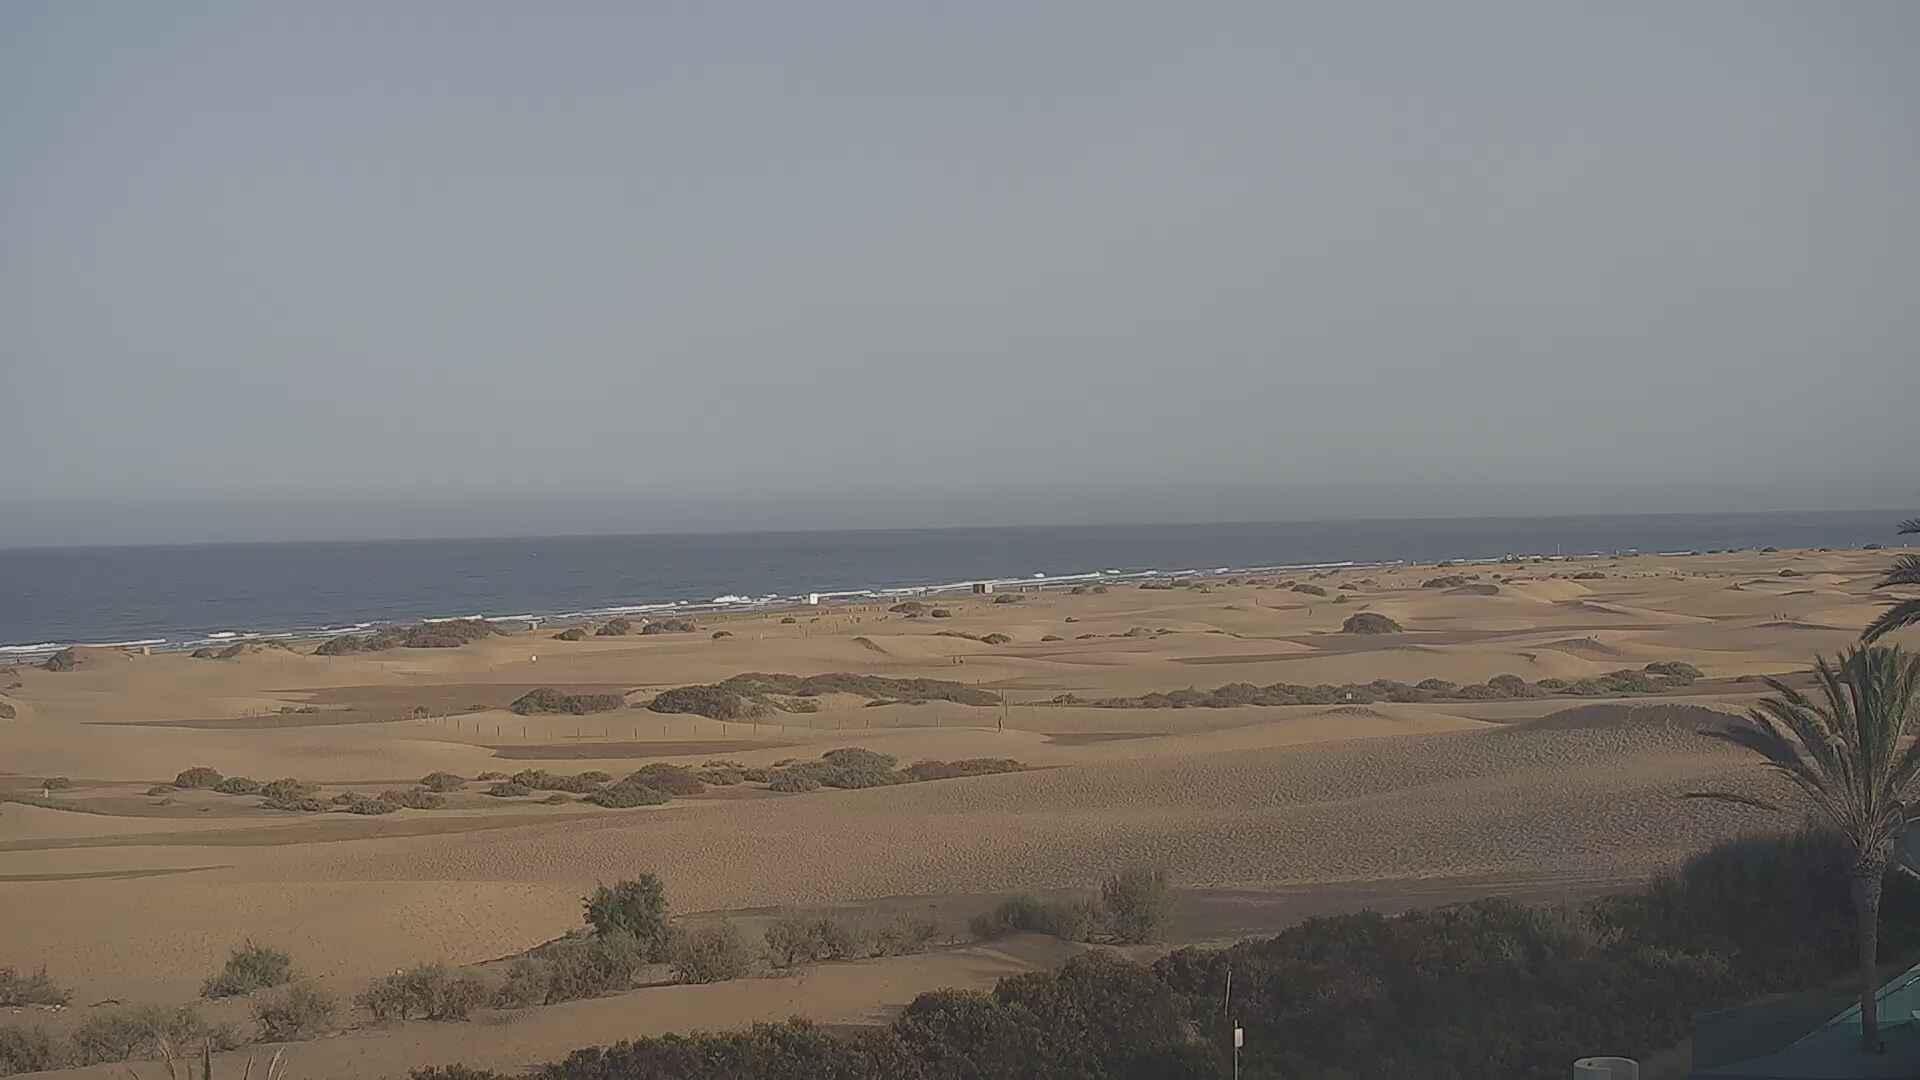 Playa del Ingles (Gran Canaria) Sat. 19:36